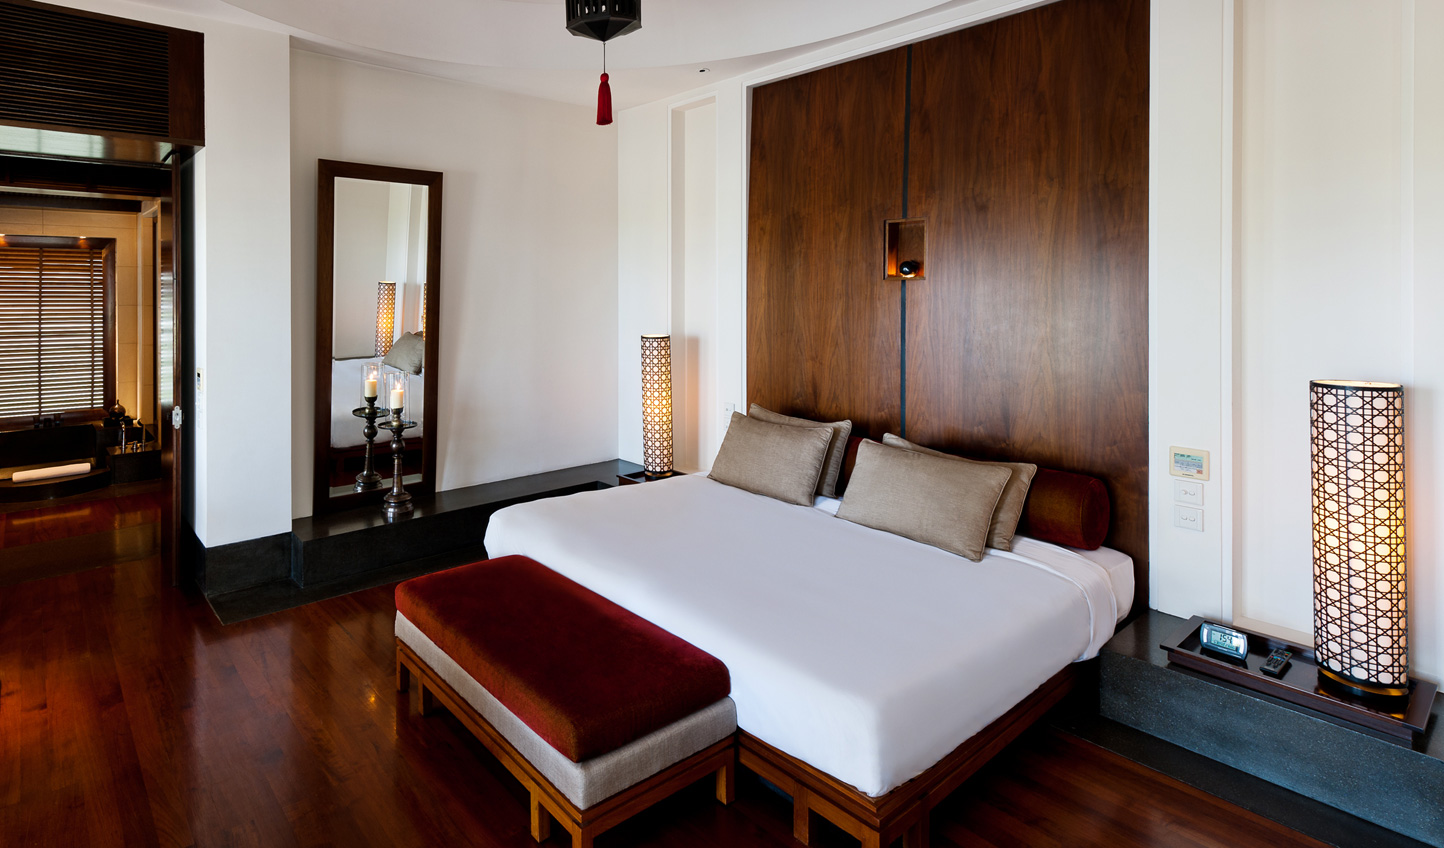 Sleek minimalist design with an Arabian warmth